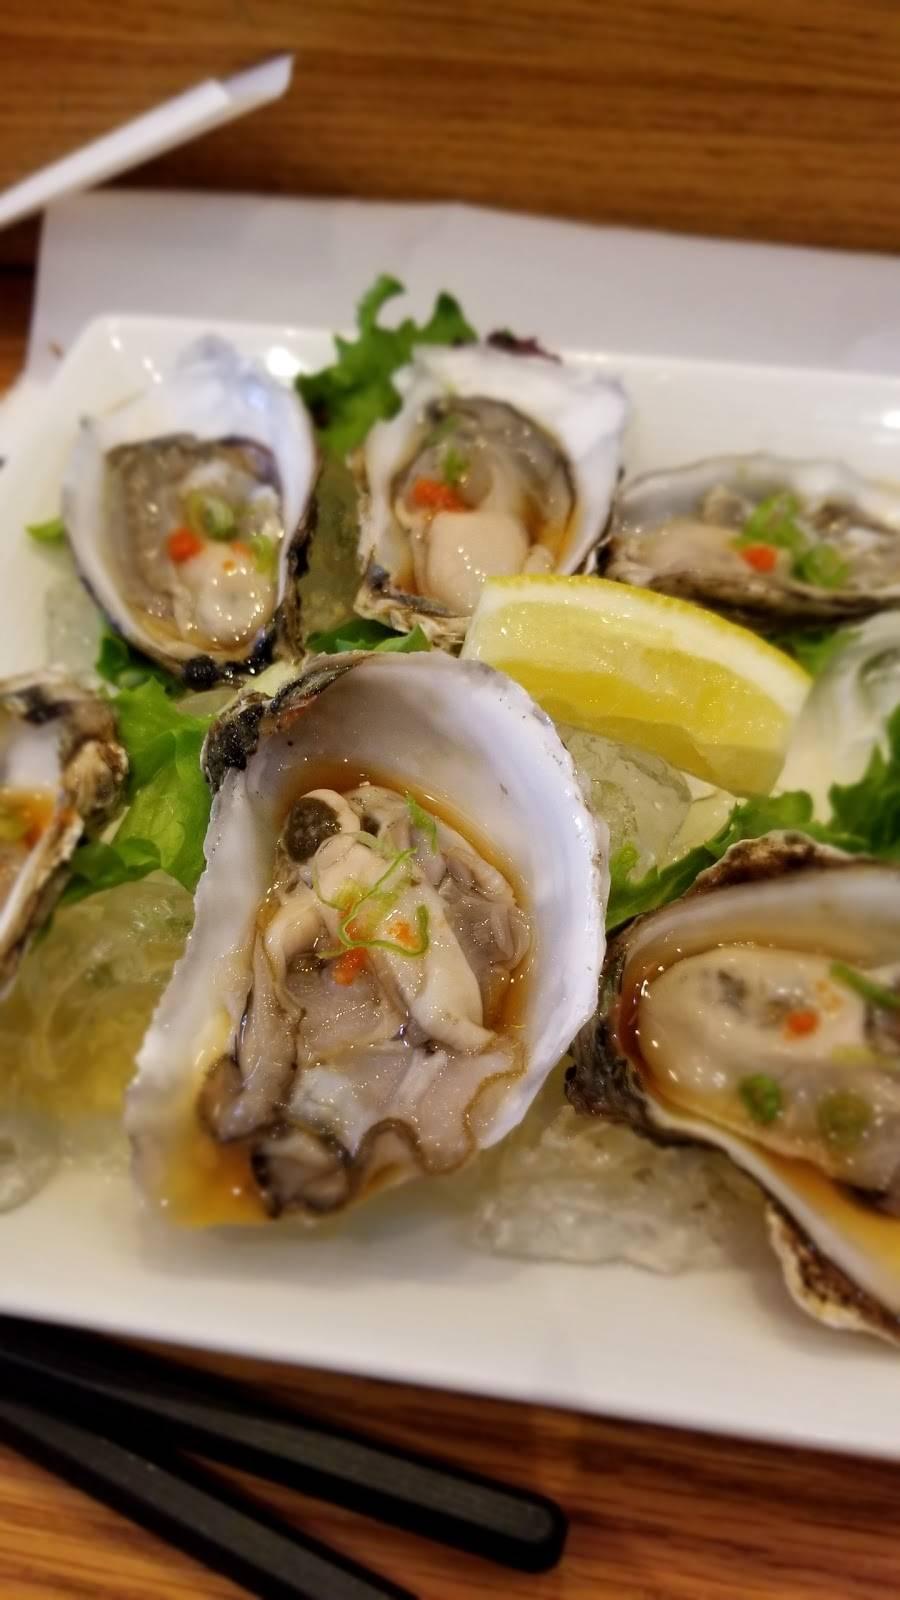 Yamagata | restaurant | 1636 Palisade Ave, Fort Lee, NJ 07024, USA | 2015850469 OR +1 201-585-0469